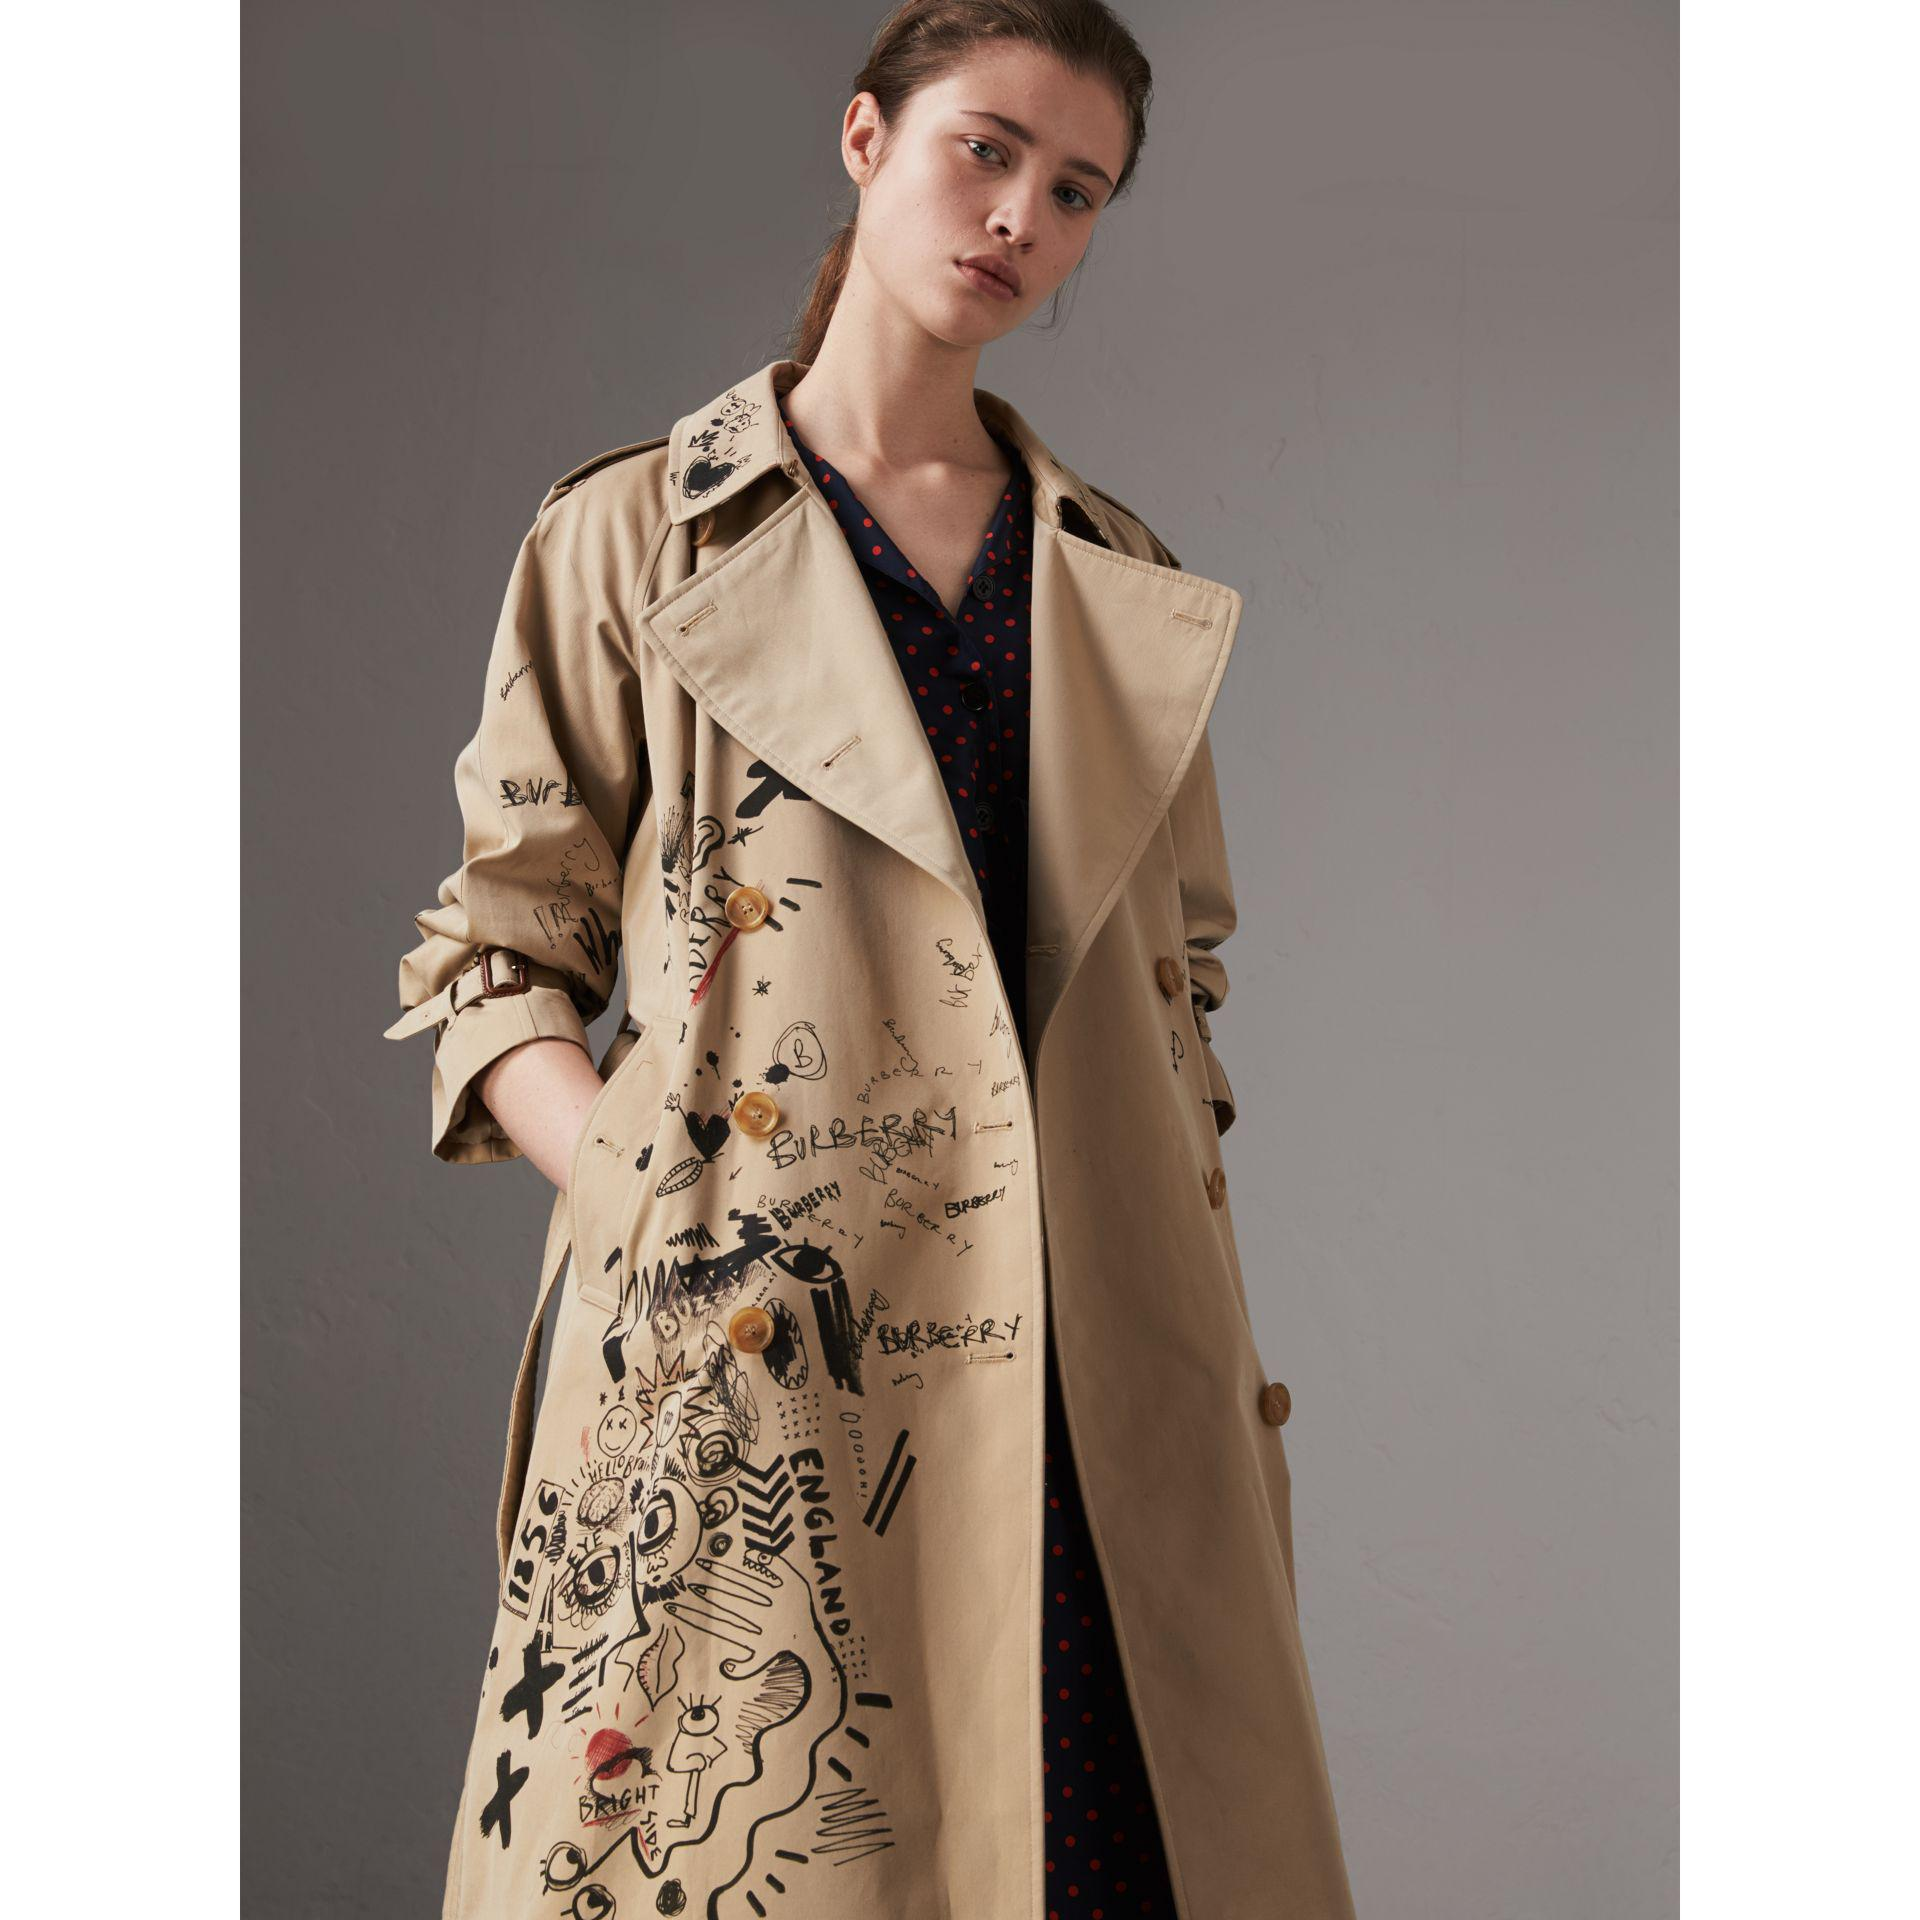 Lyst Burberry Sketch Print Cotton Gabardine Trench Coat